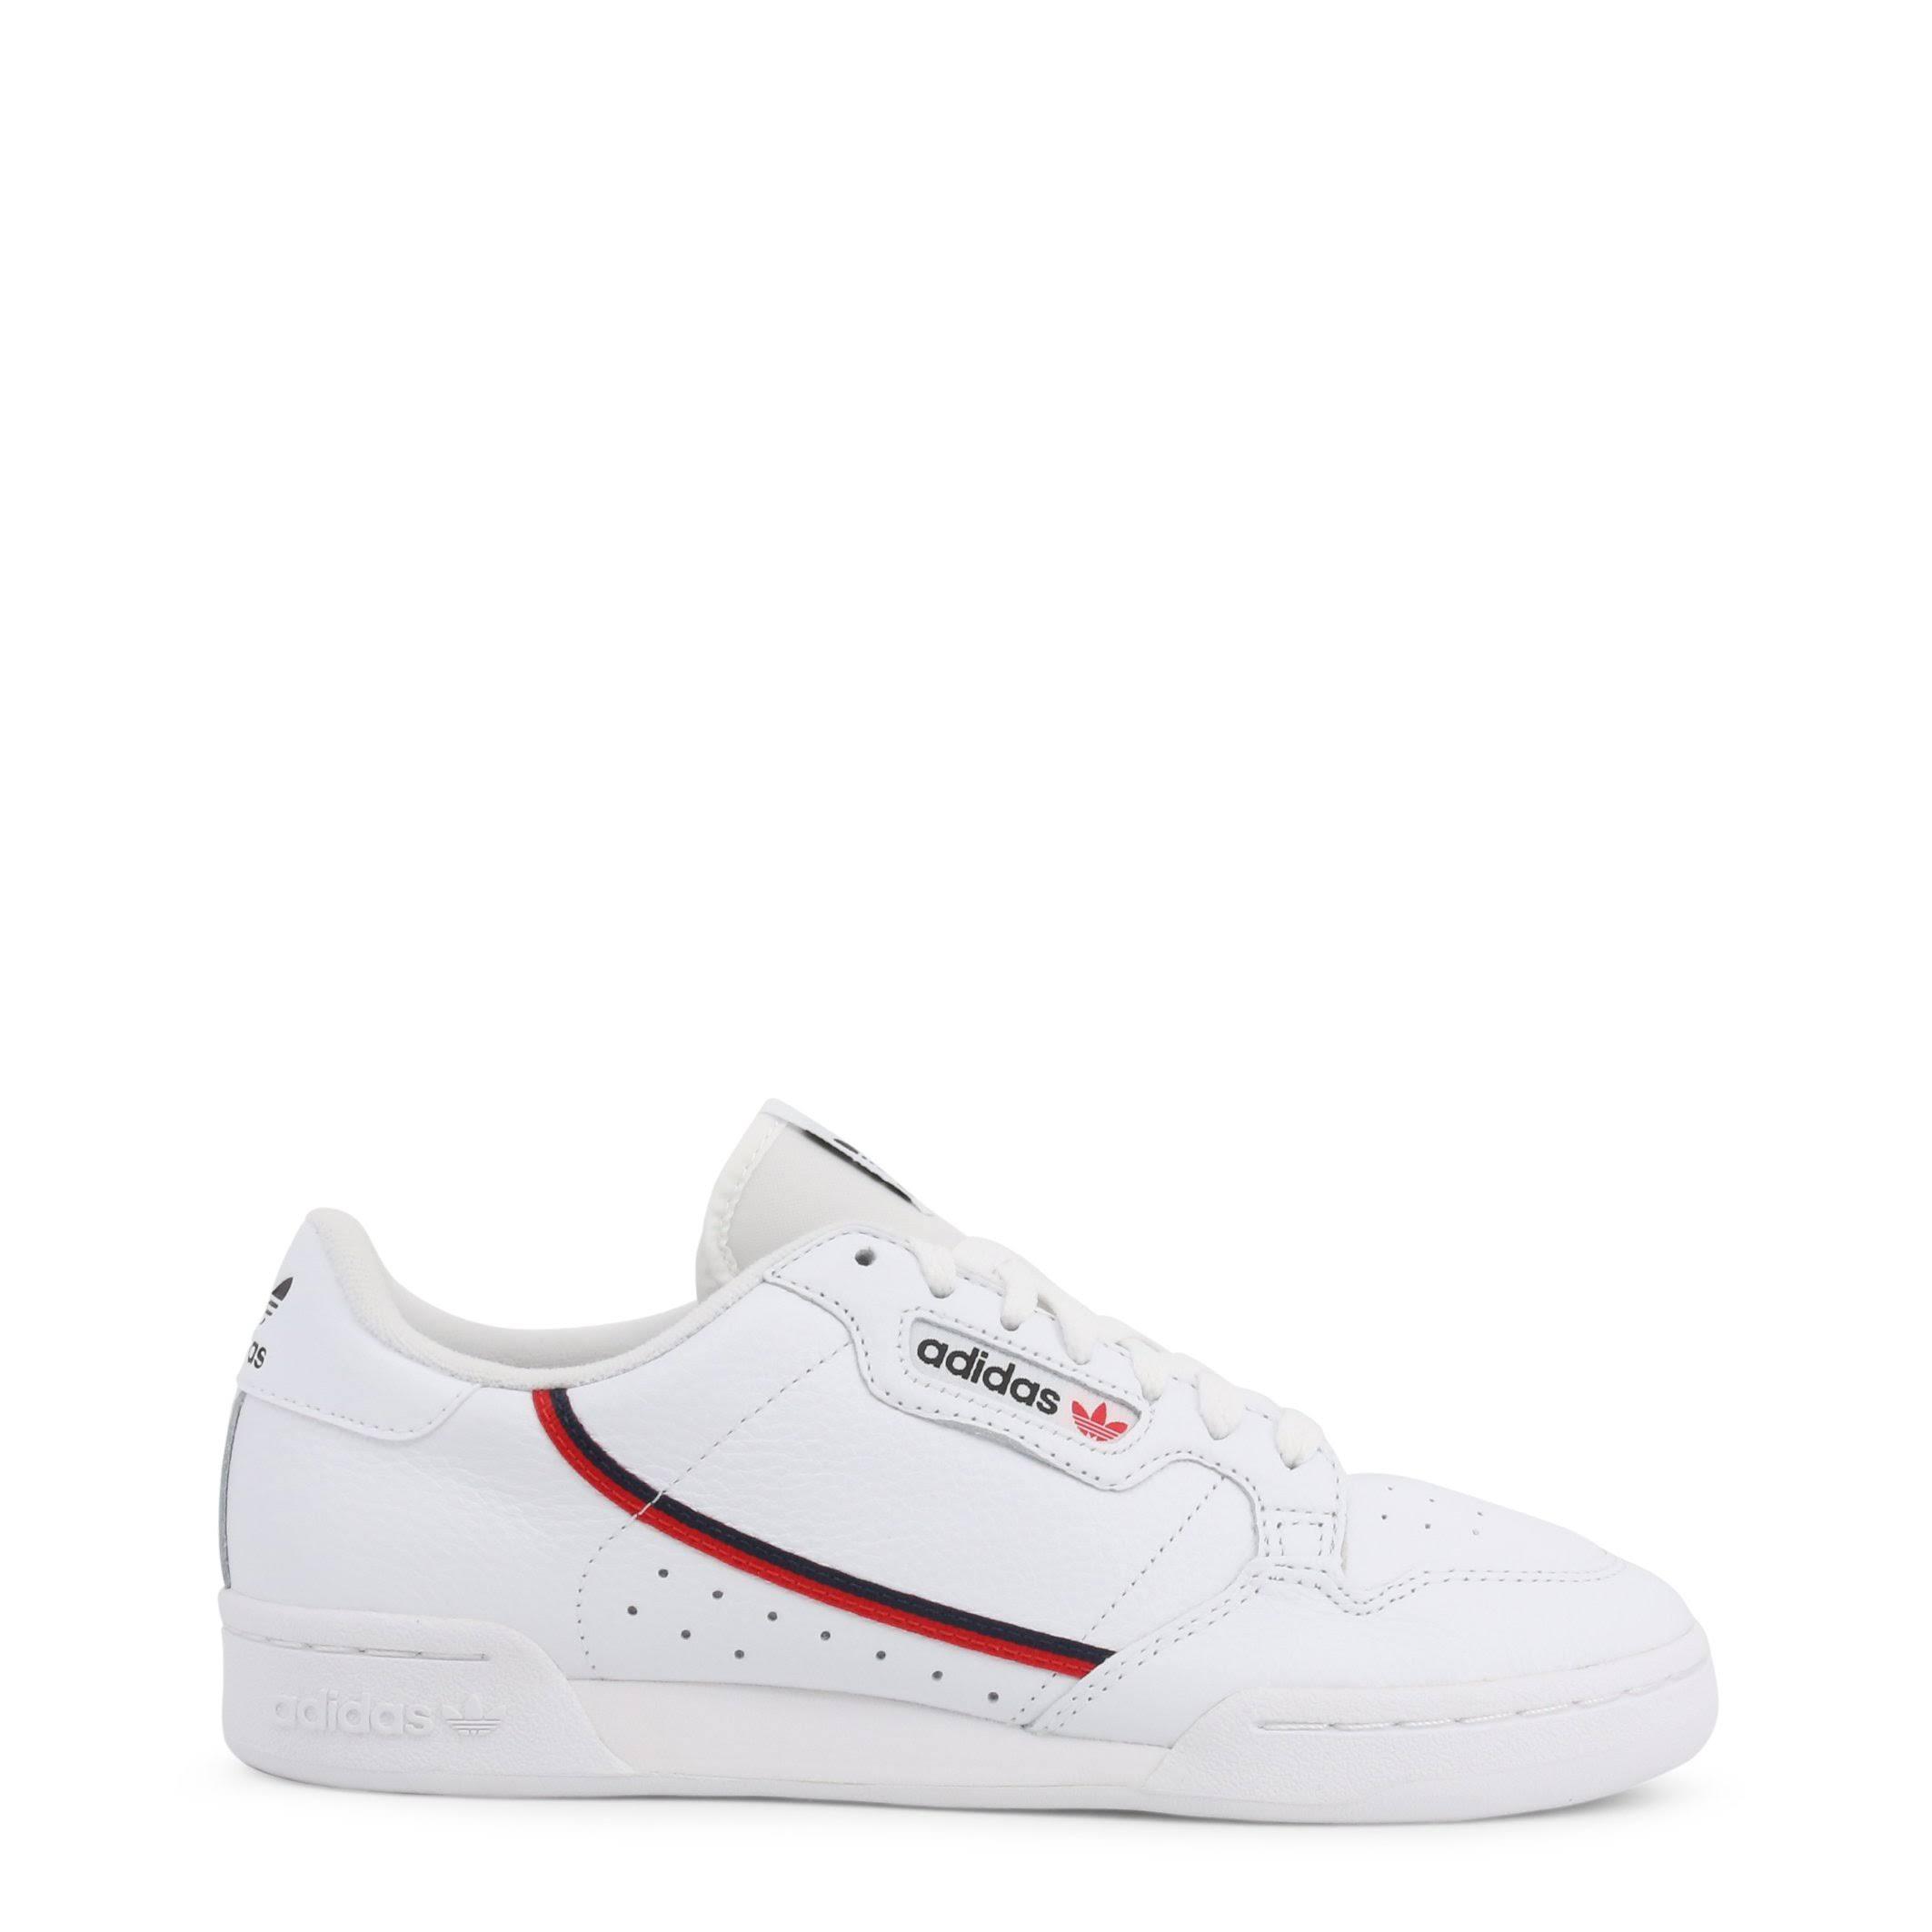 Adidas - Continental 80 White / UK 10.5